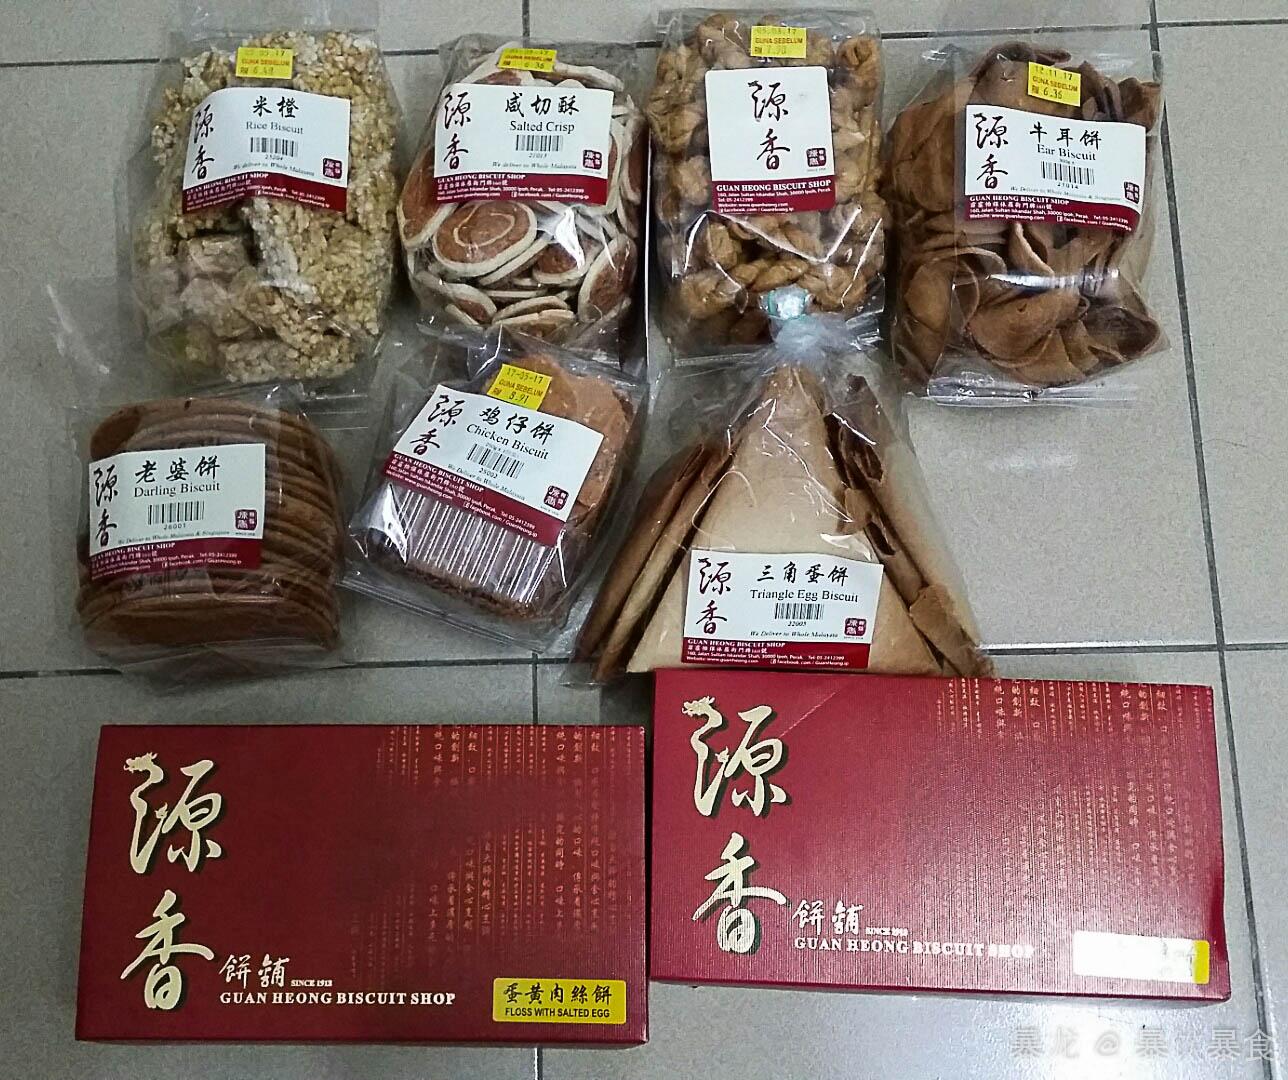 暴龍敗家女: 暴飲暴食: 《源香餅鋪》 @ Ipoh Guan Heong Biscuit Shop